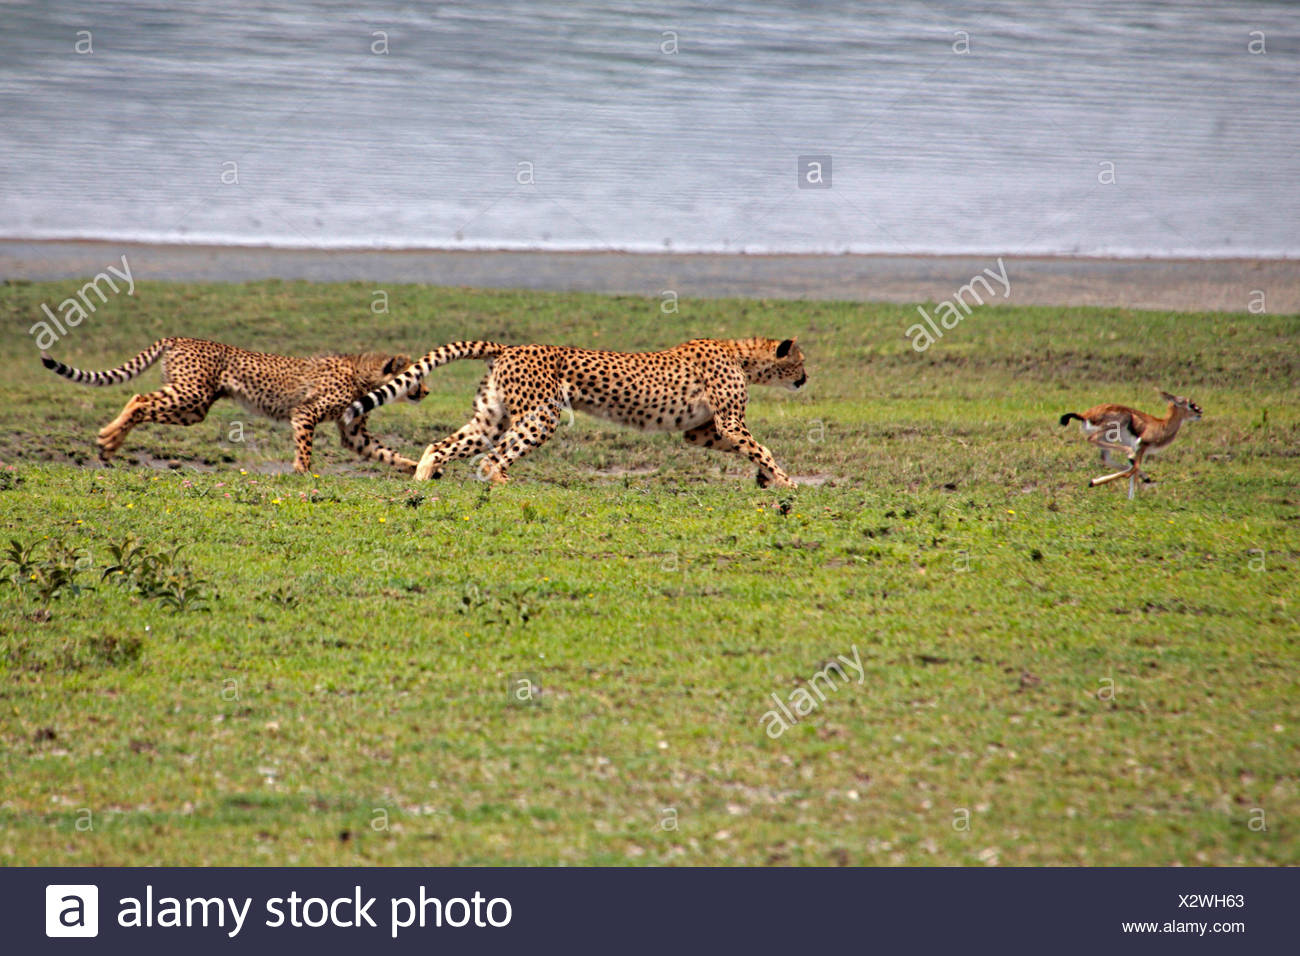 Gepard (Acinonyx Jubatus), zwei Geparden jagen eine Gazelle, Serengeti Nationalpark Stockbild